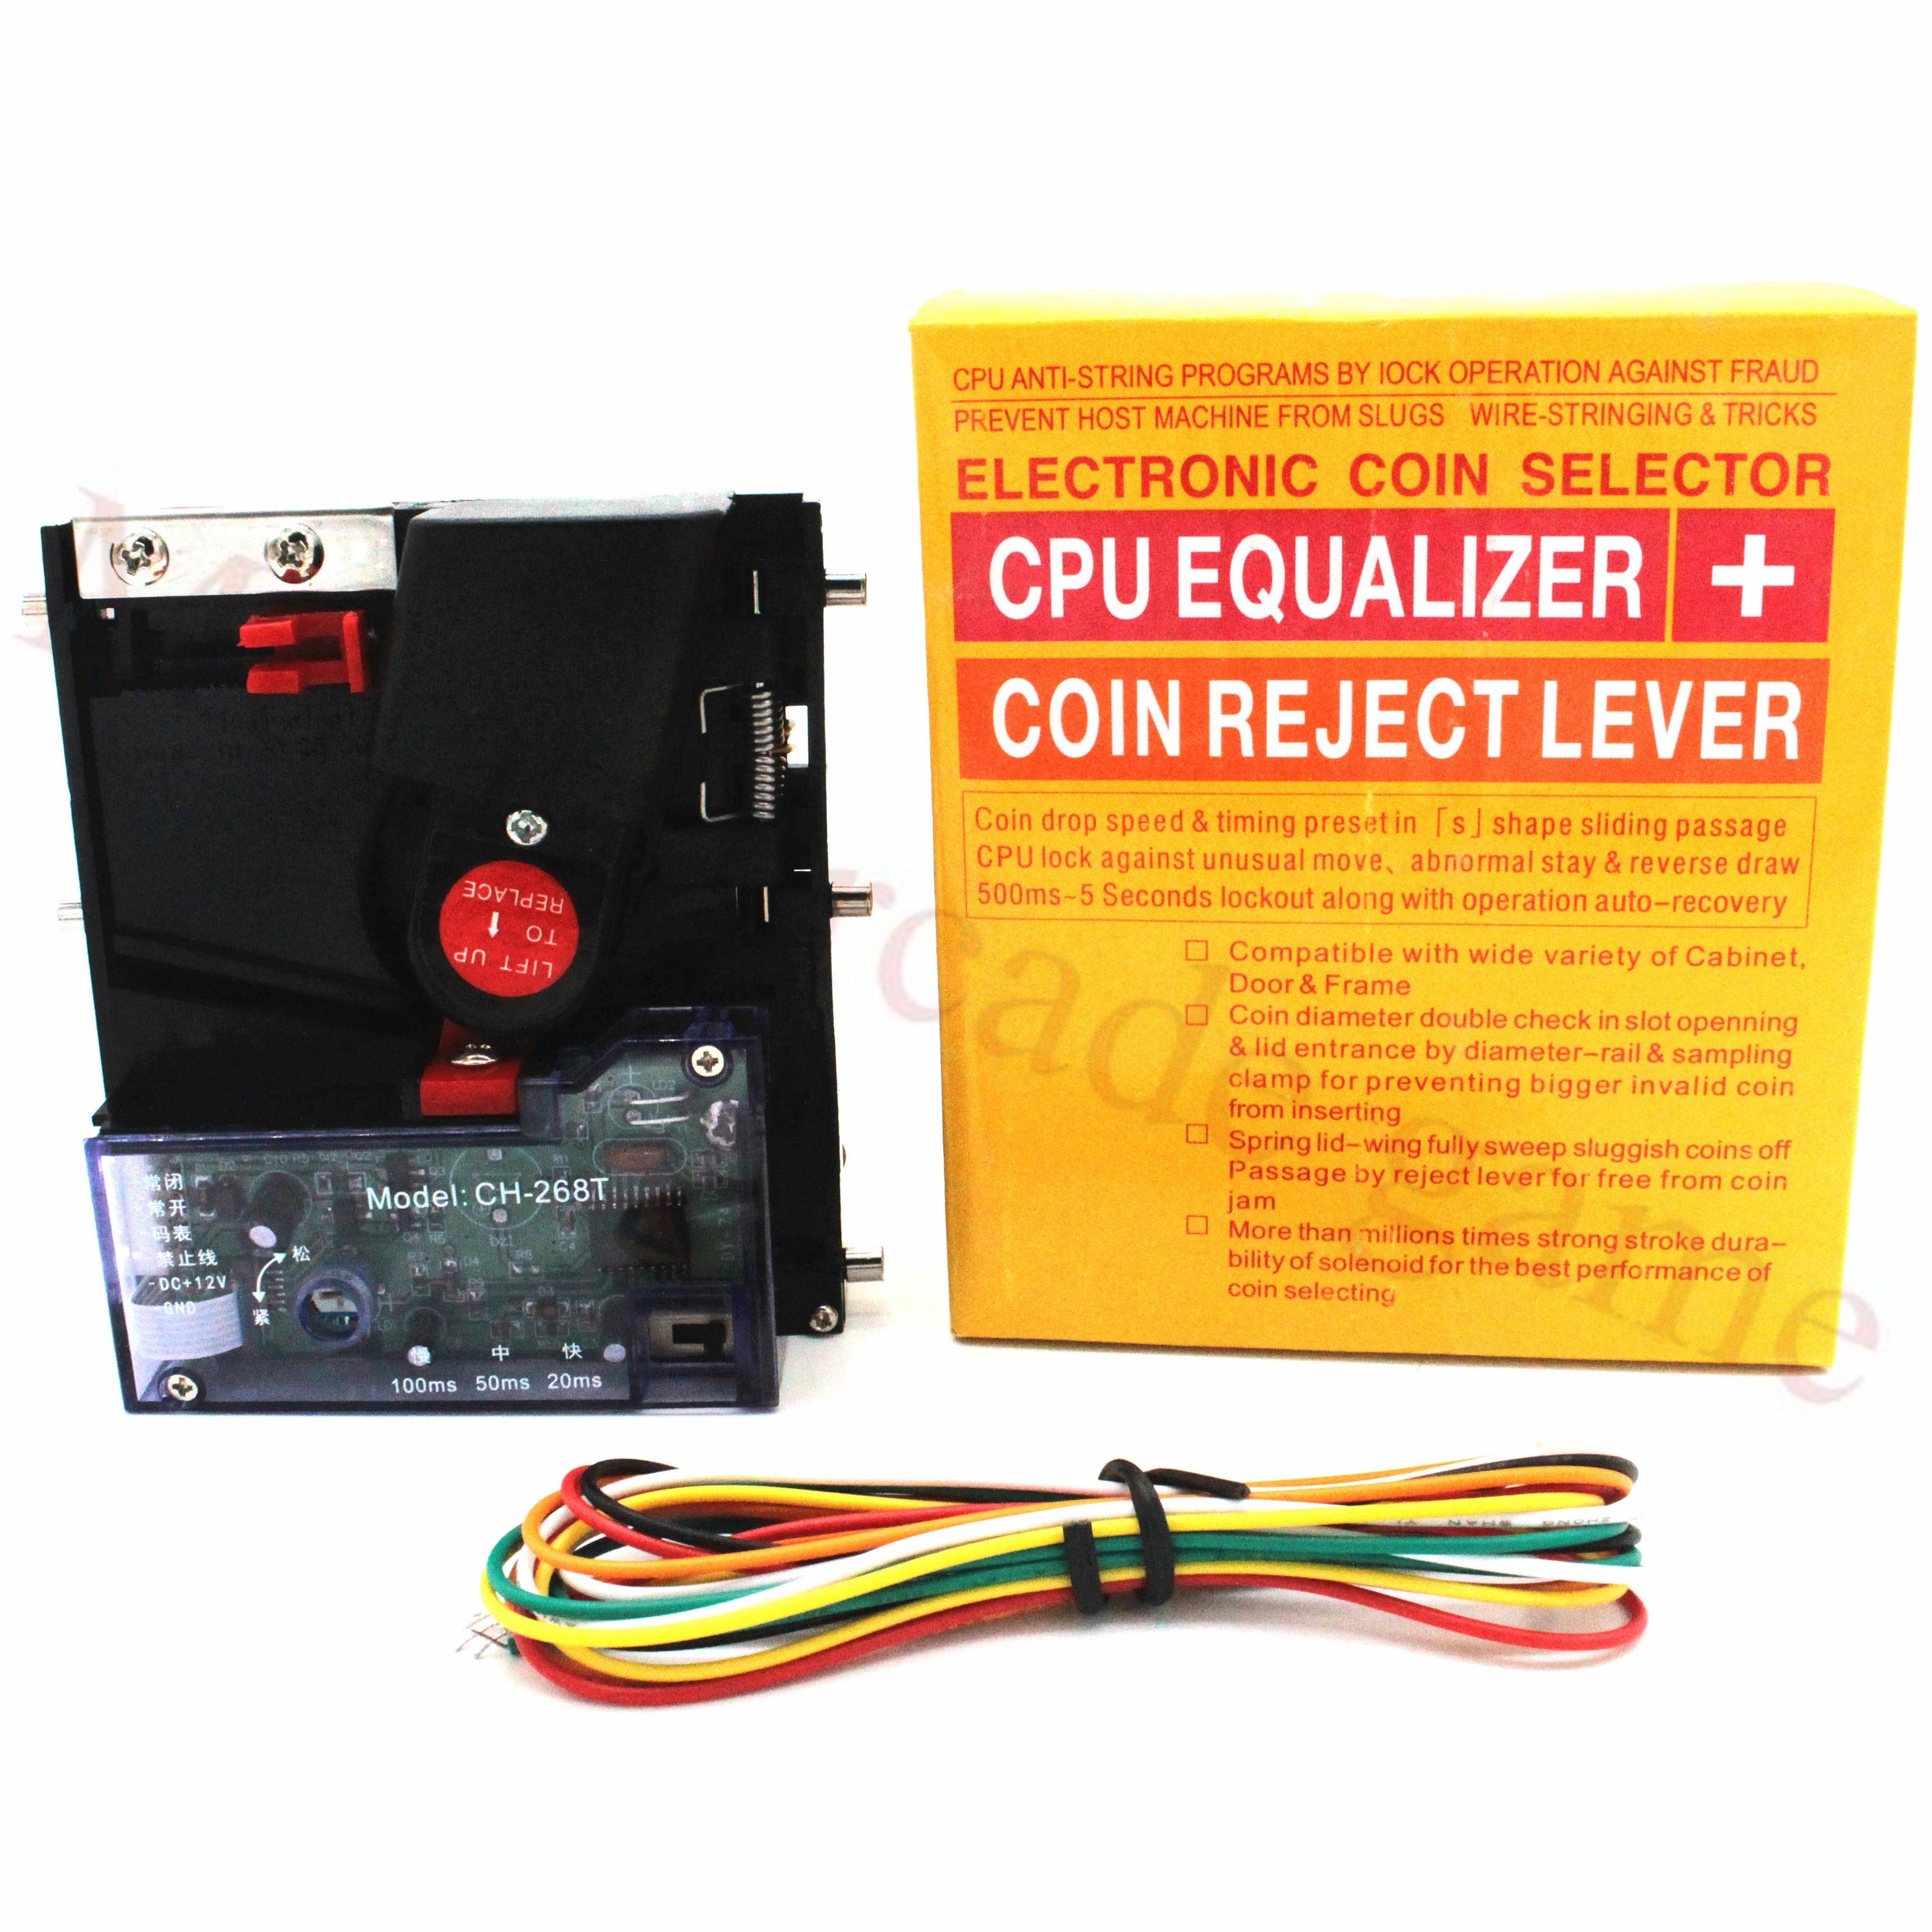 CH-268T de entrada superior, Selector de monedas individual, receptor de monedas Vertical para máquina expendedora de Arcade, Selector de fichas, Mech